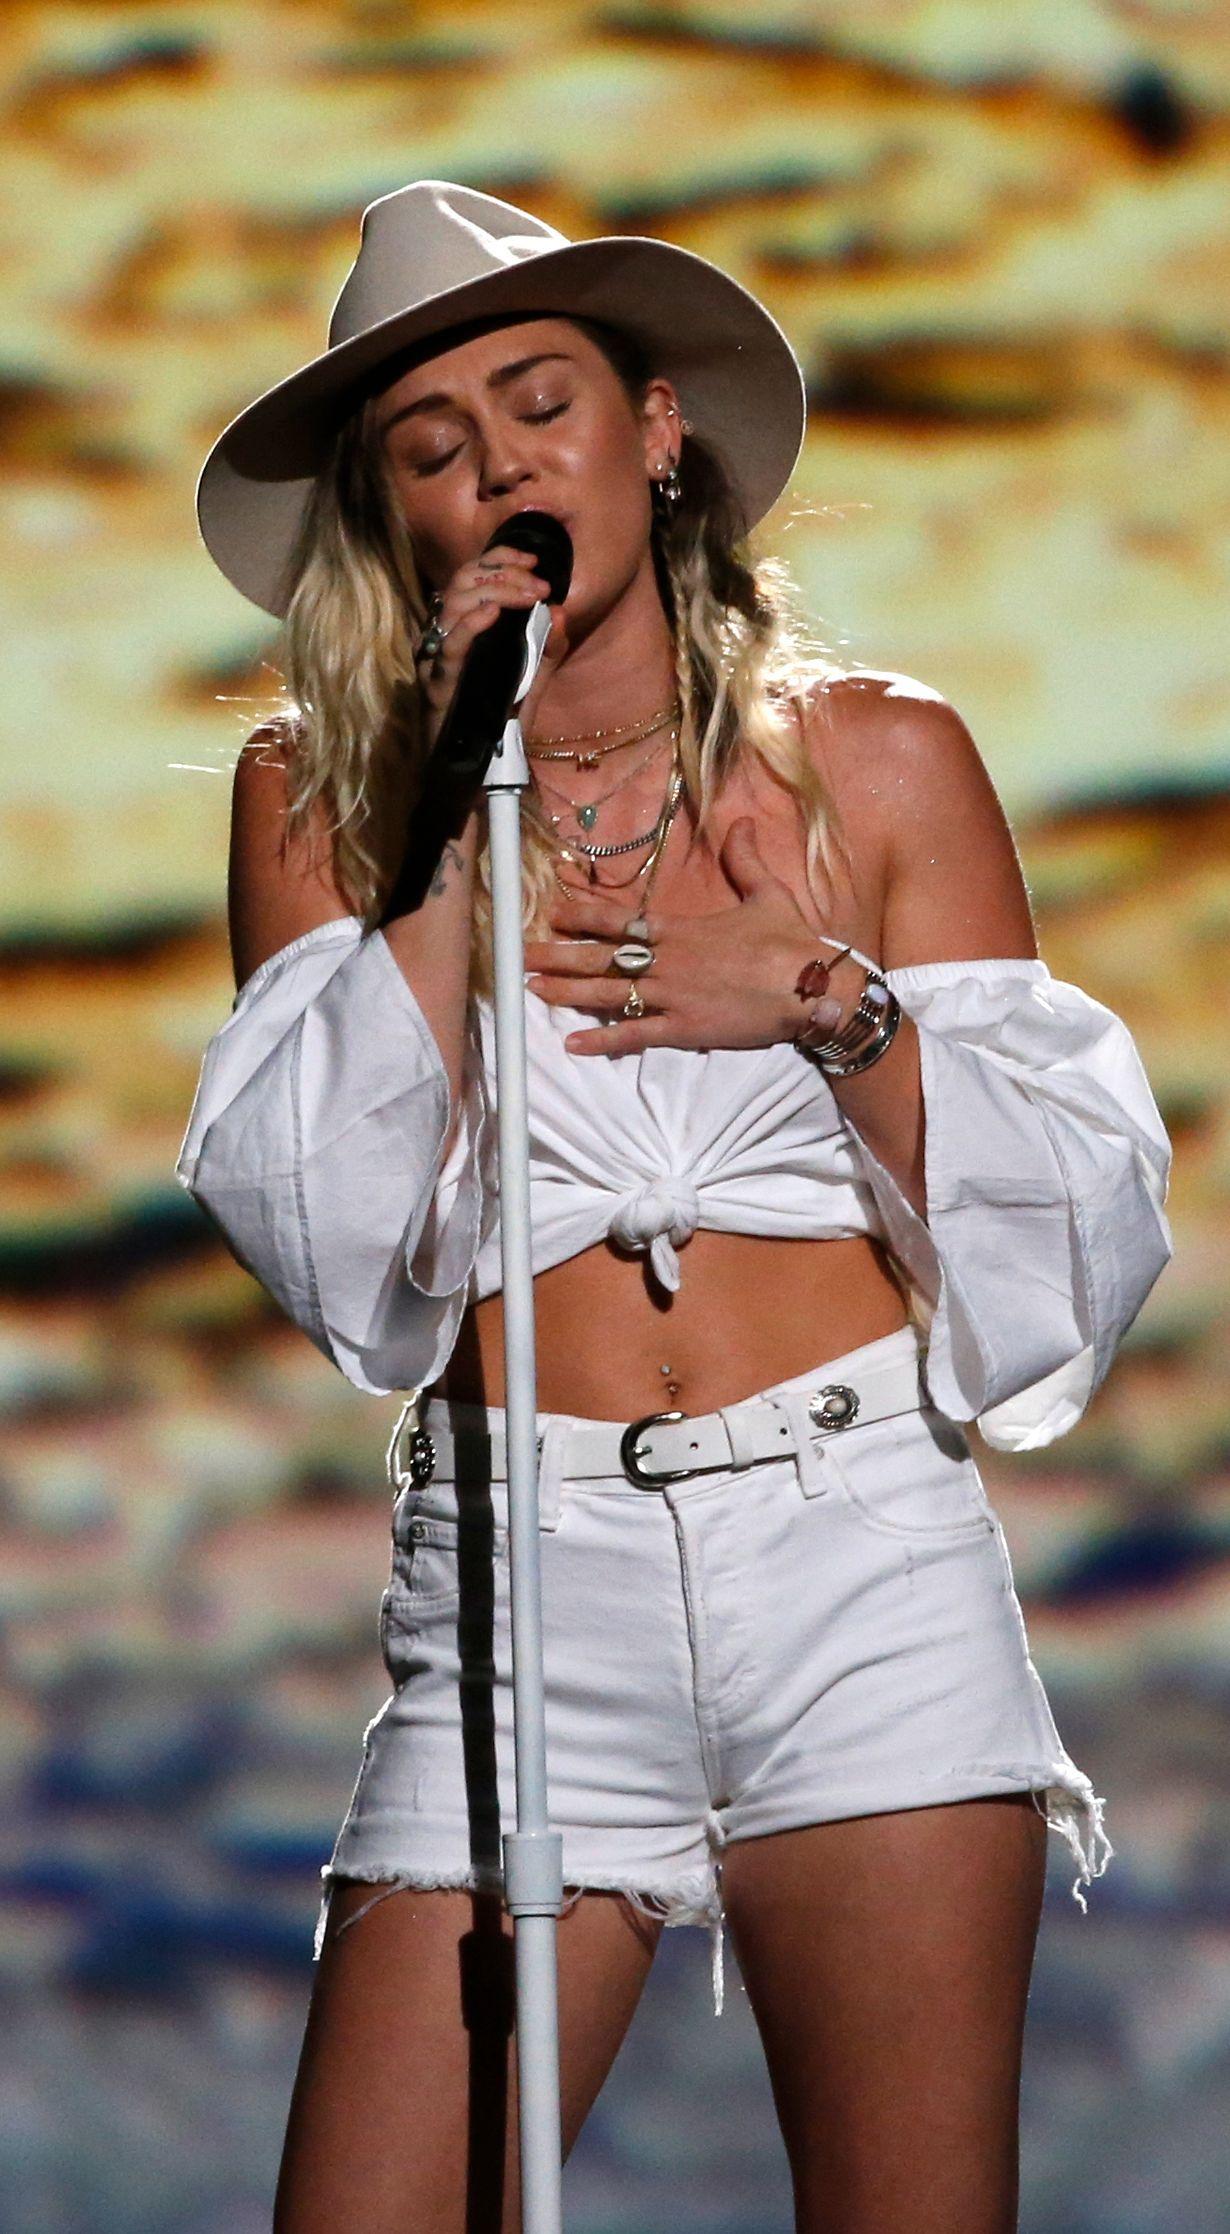 NEDTONET: Miley Cyrus på scenen.